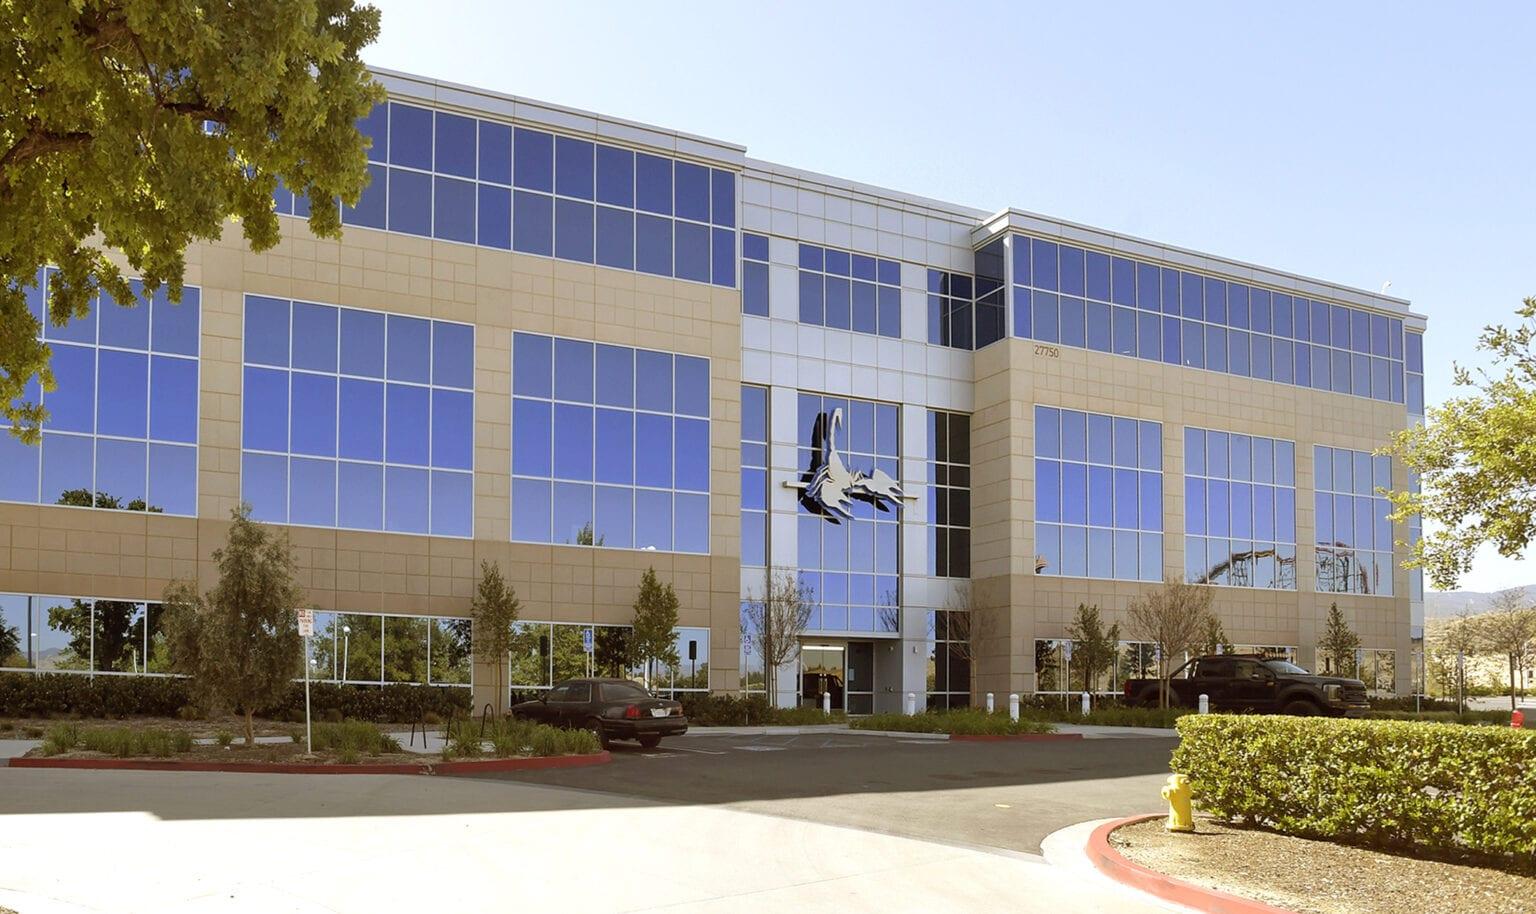 scvnews.com - Scorpion Announces Plans to Move Headquarters